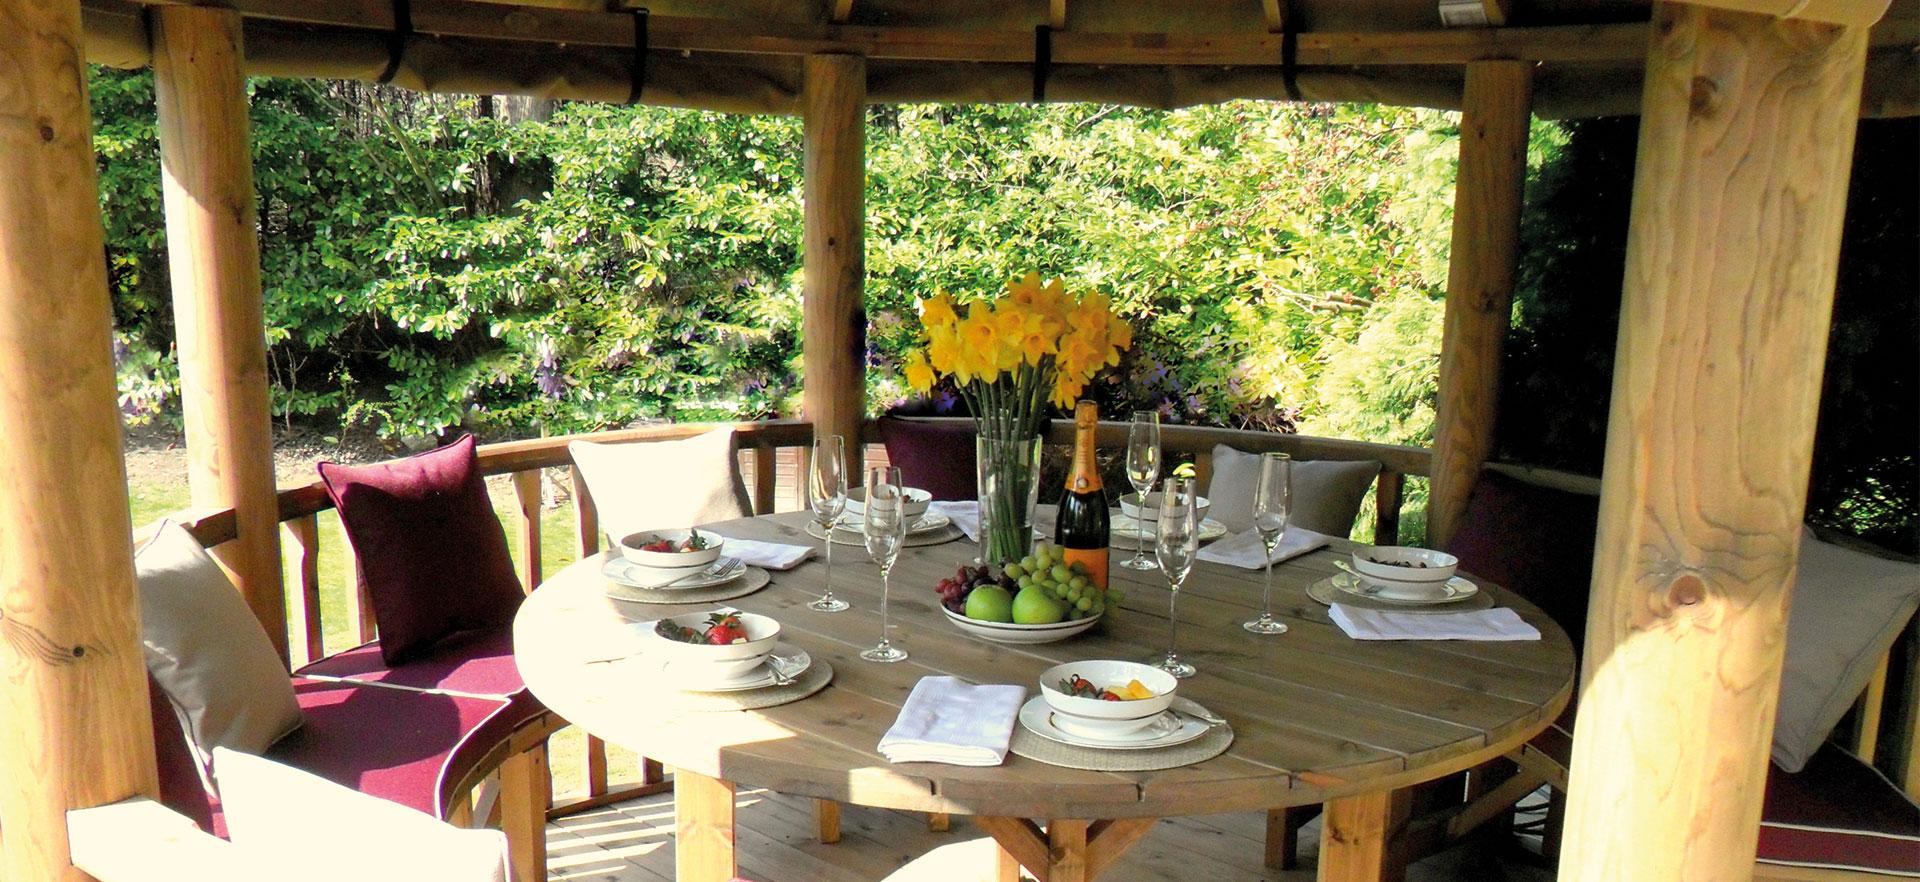 looking inside 3 metre gazebo with table set set for dinner